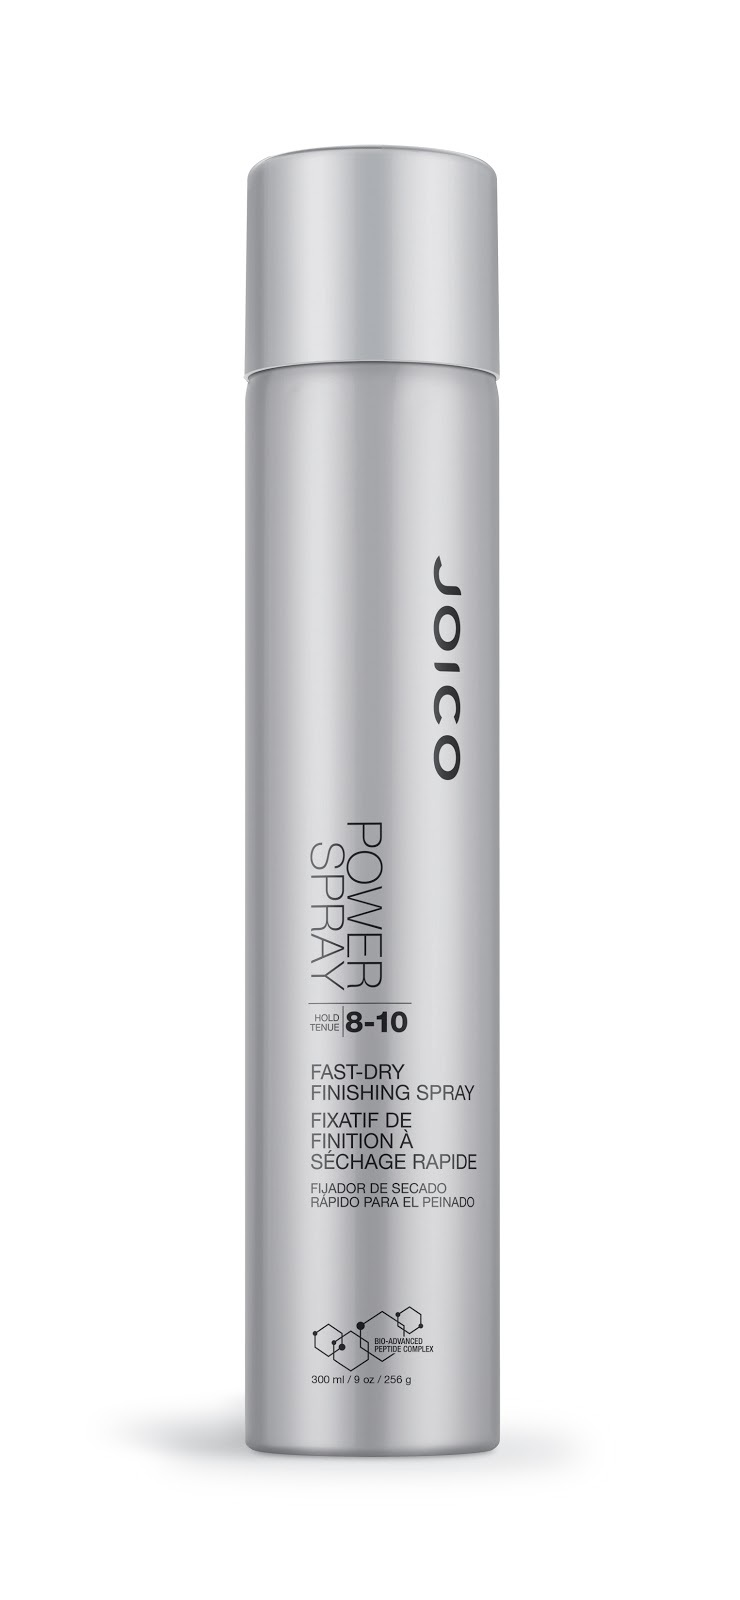 JOICO Power spray fast - dry finishing spray - hold 8-10